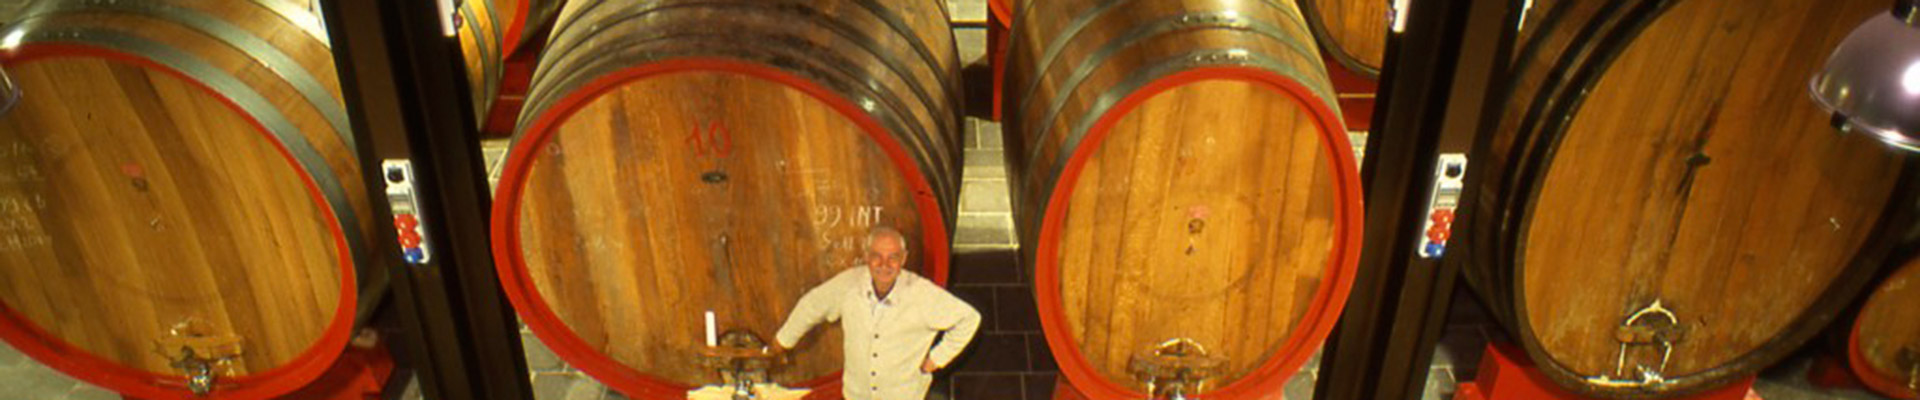 Toscana Igp 100% Sangiovese Soldera® Case Basse®